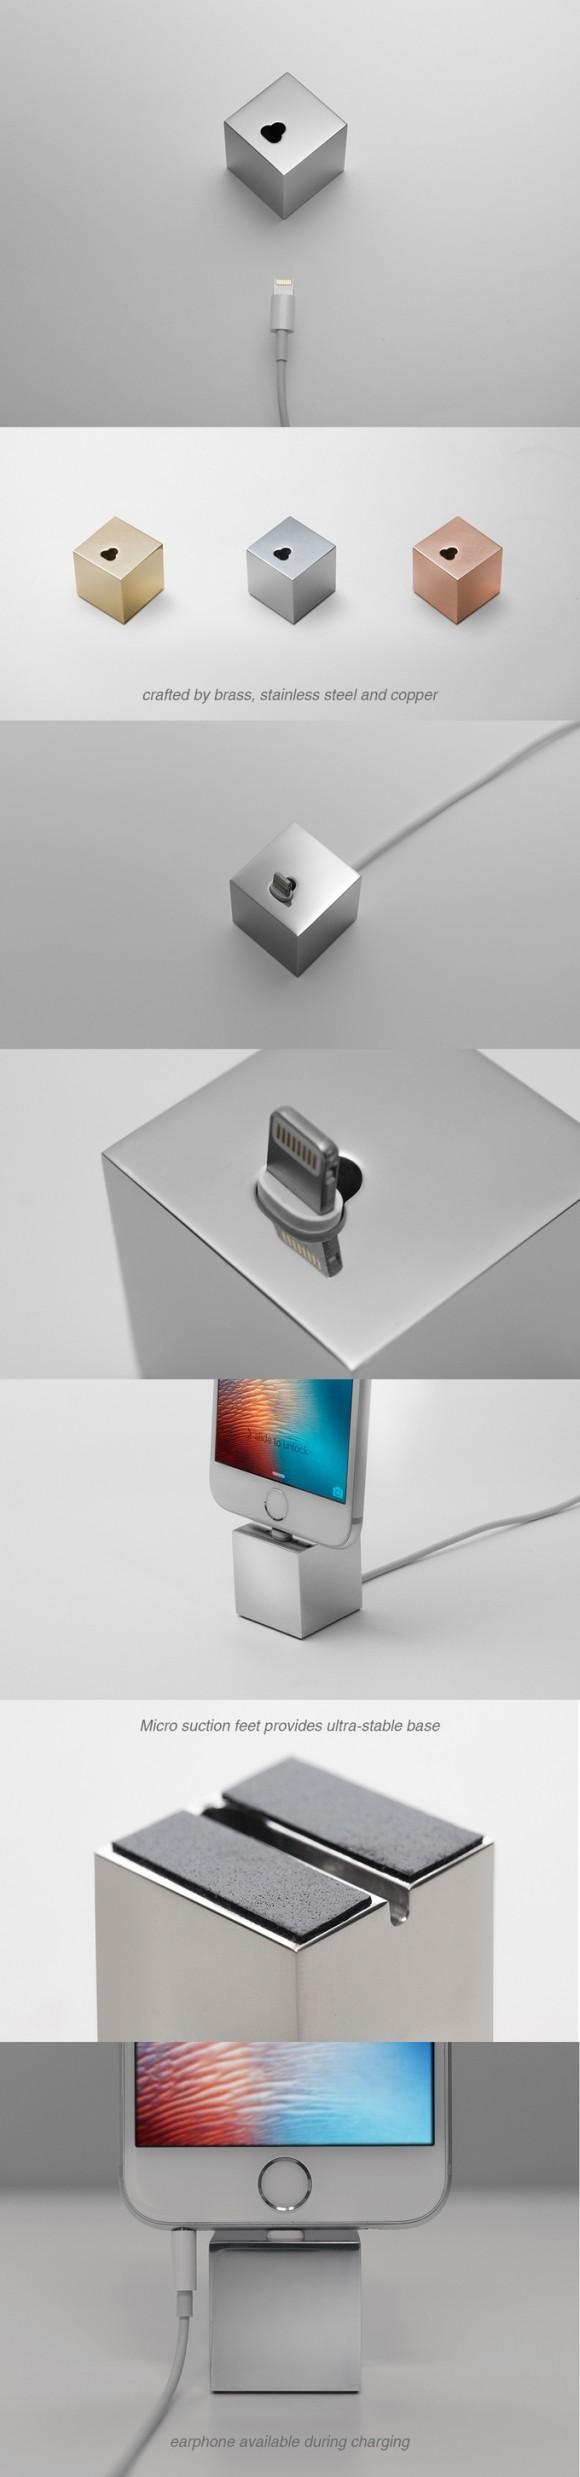 iPhoneドック